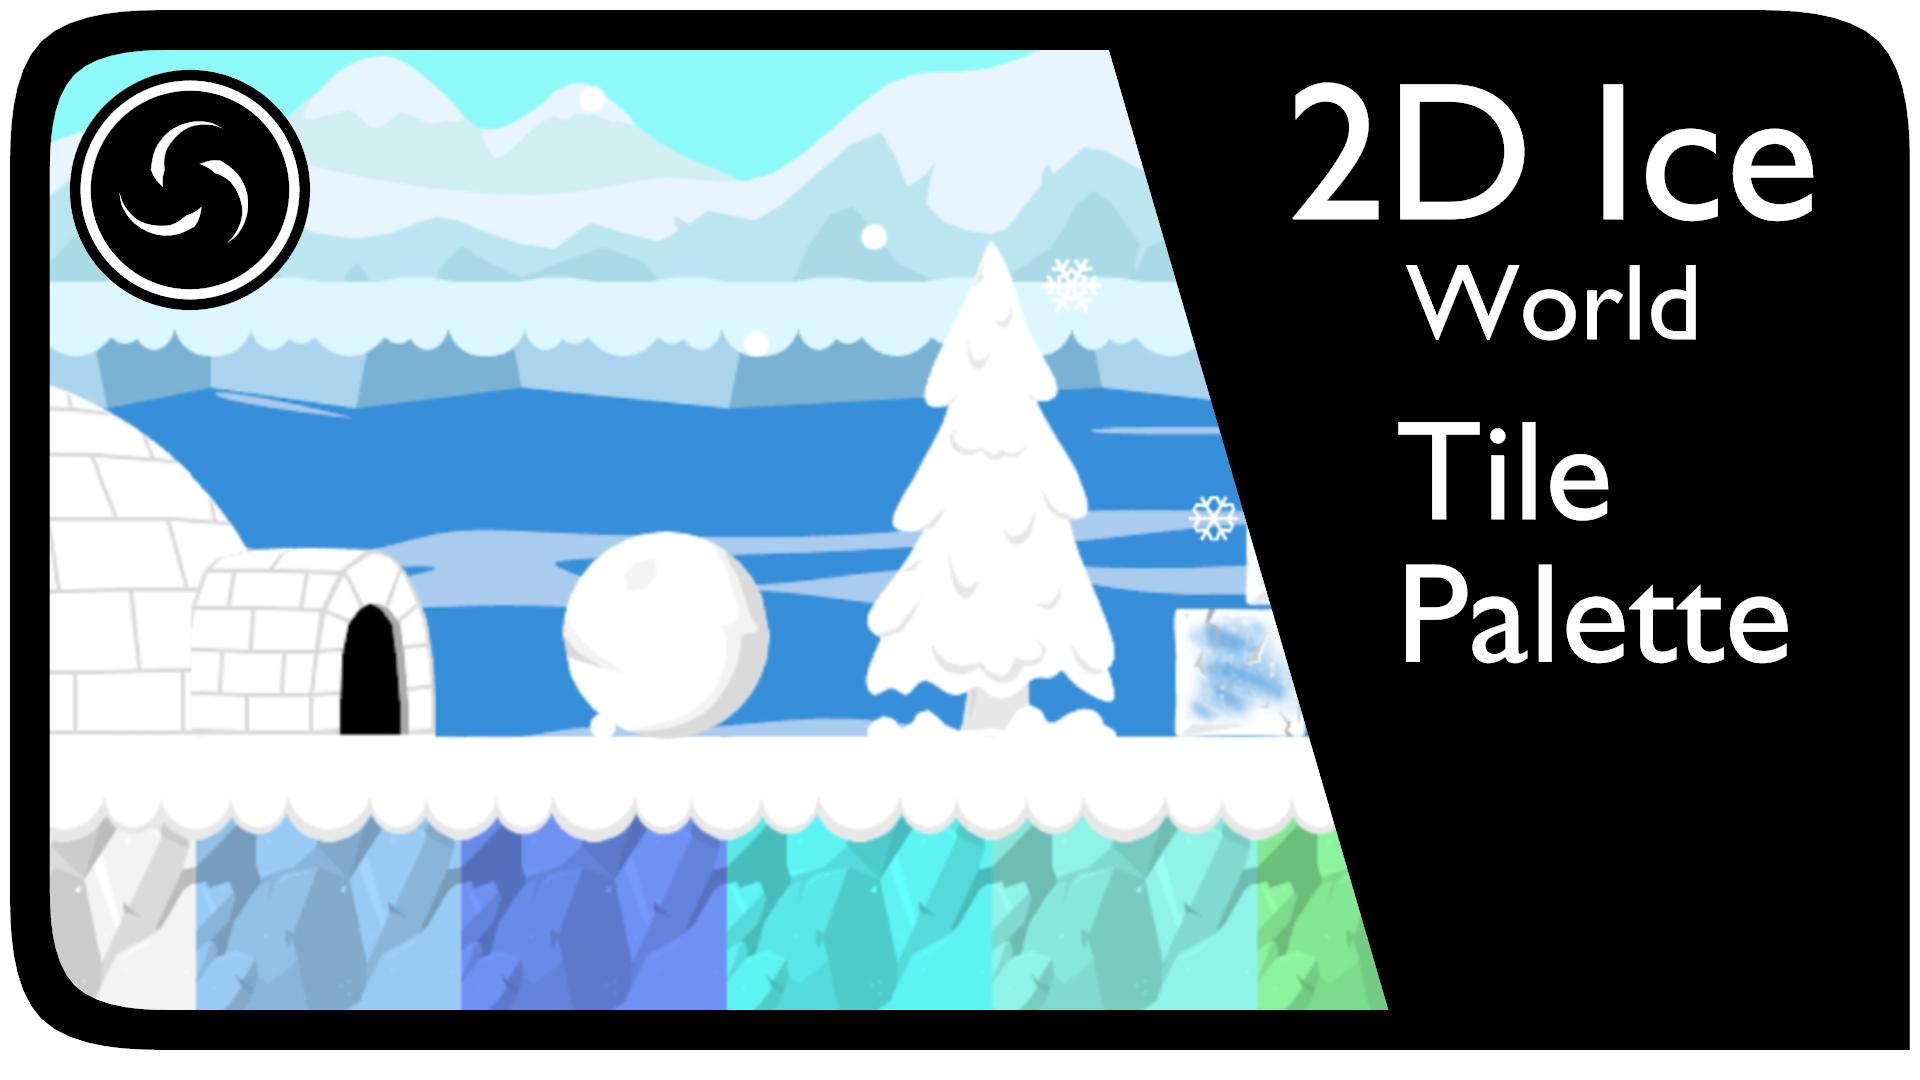 2D Ice World